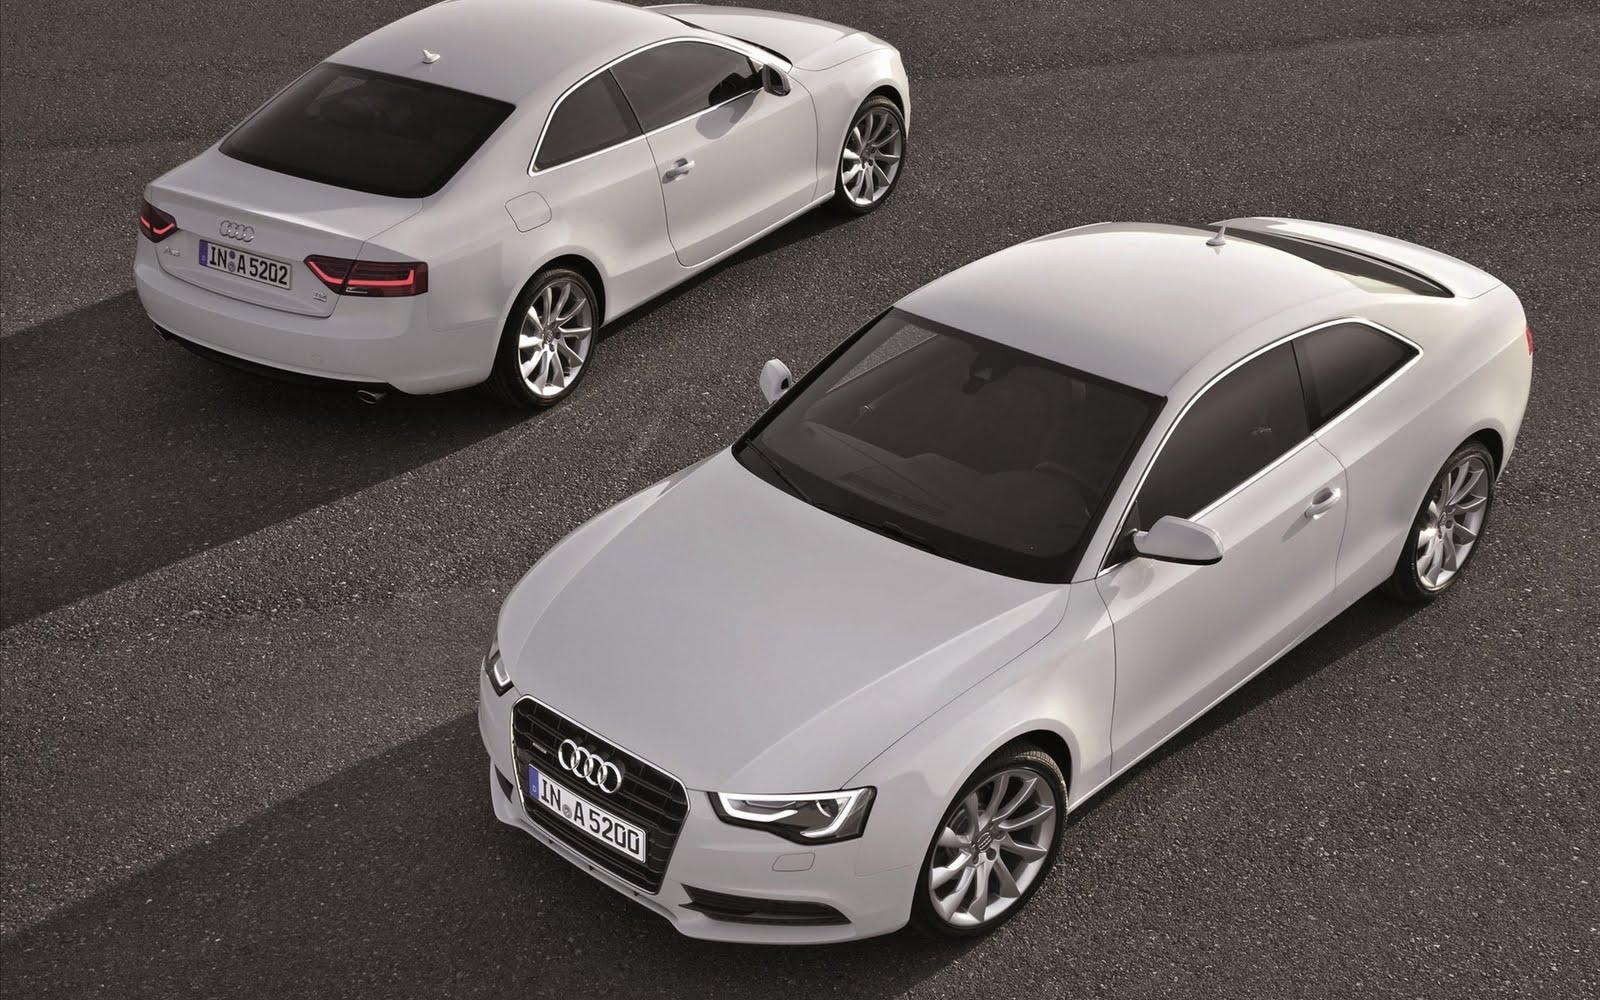 http://4.bp.blogspot.com/-JI5HXSS5dVw/TjrJ4UT1kKI/AAAAAAAABQo/y64Jhi2a4-k/s1600/Audi+A5+Coupe+2012.jpg